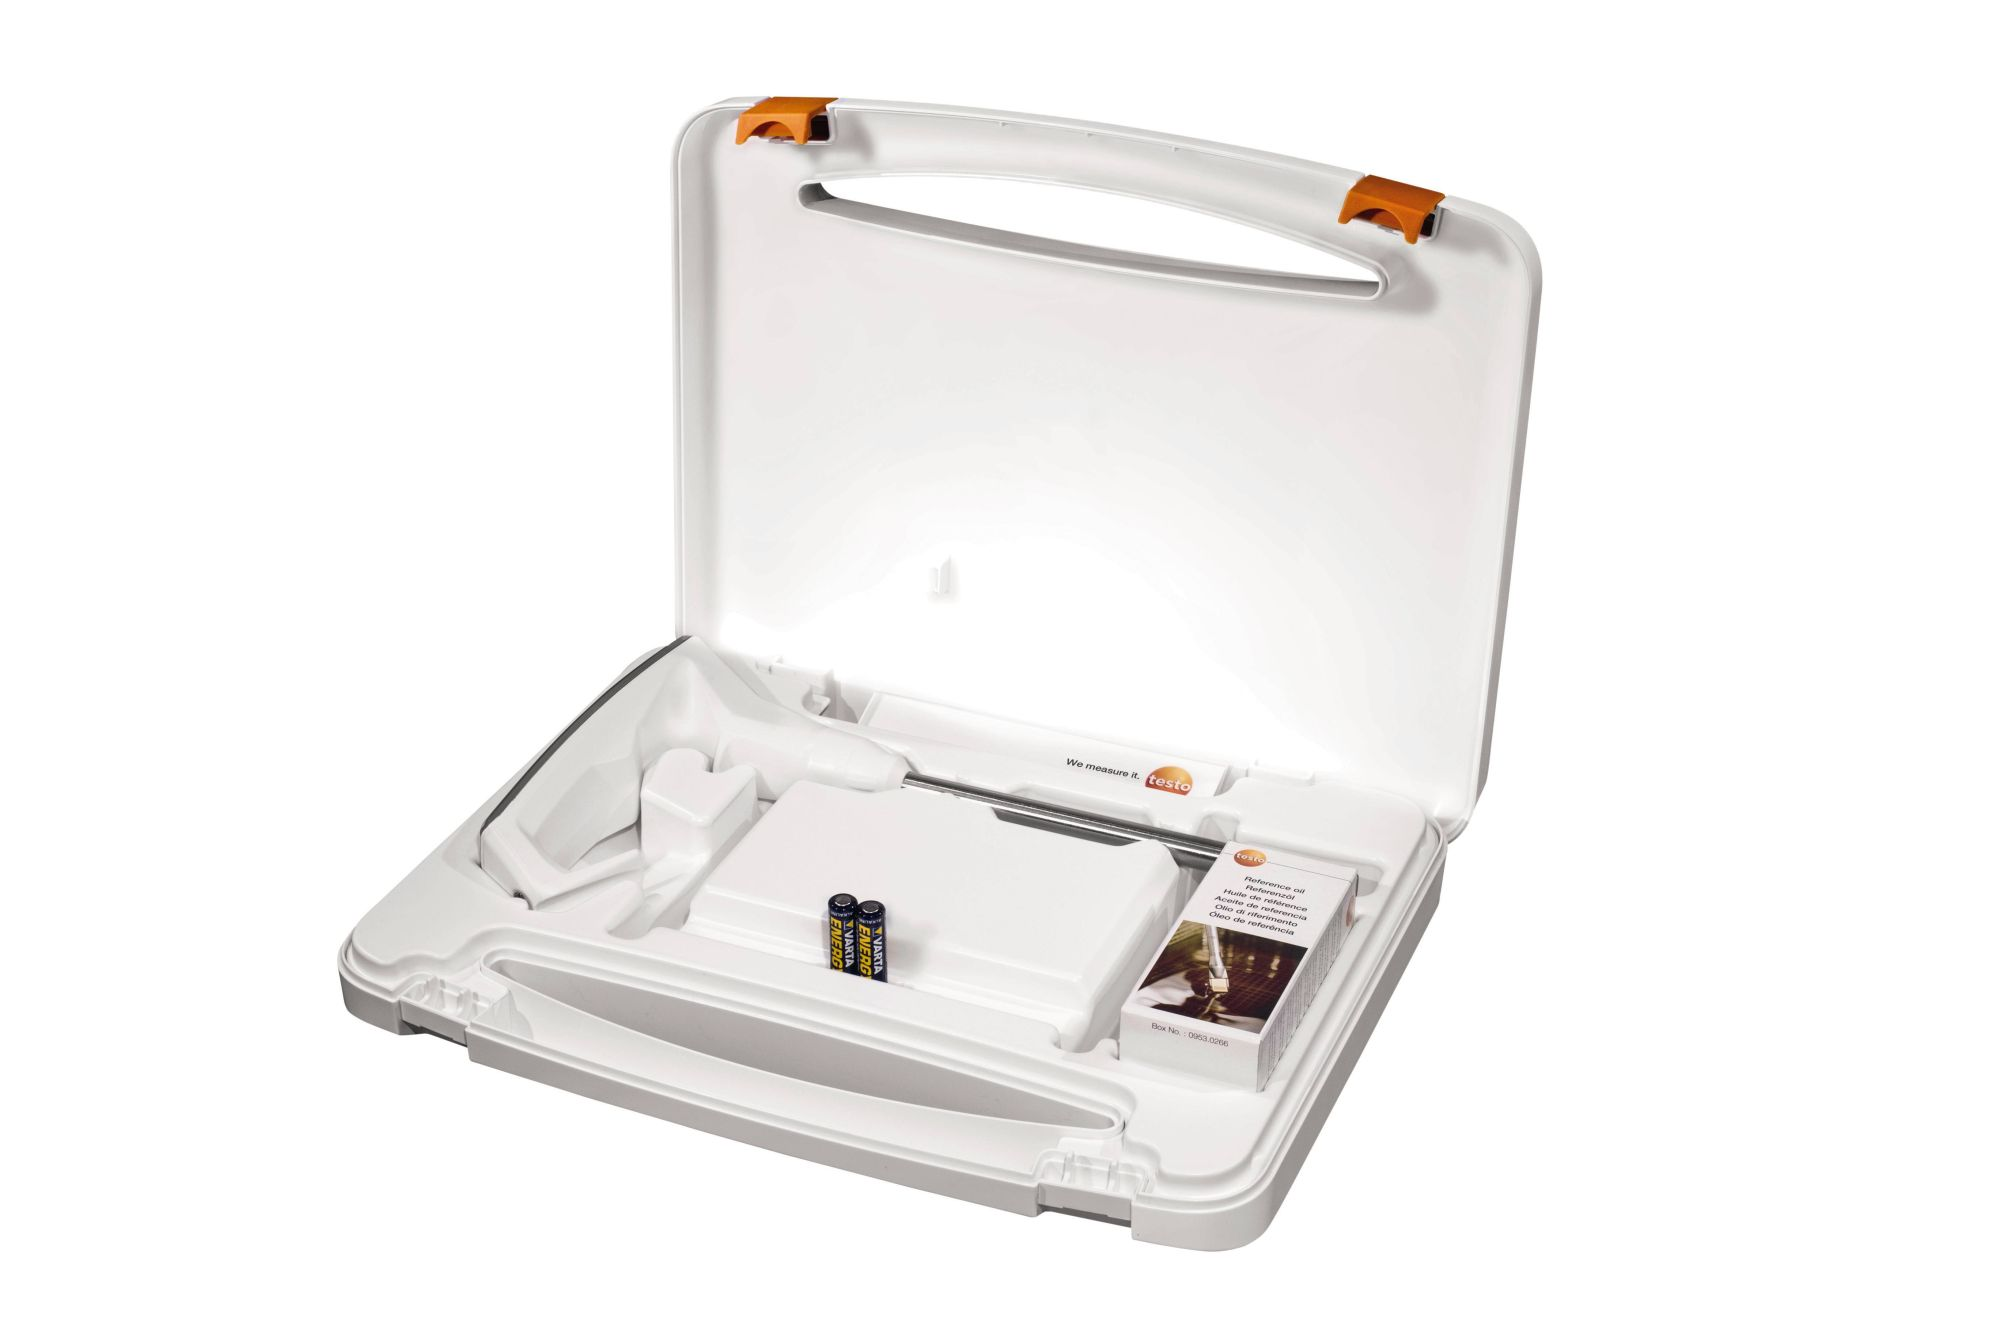 testo-270-0516-7301-accessory-analysis-005431.jpg